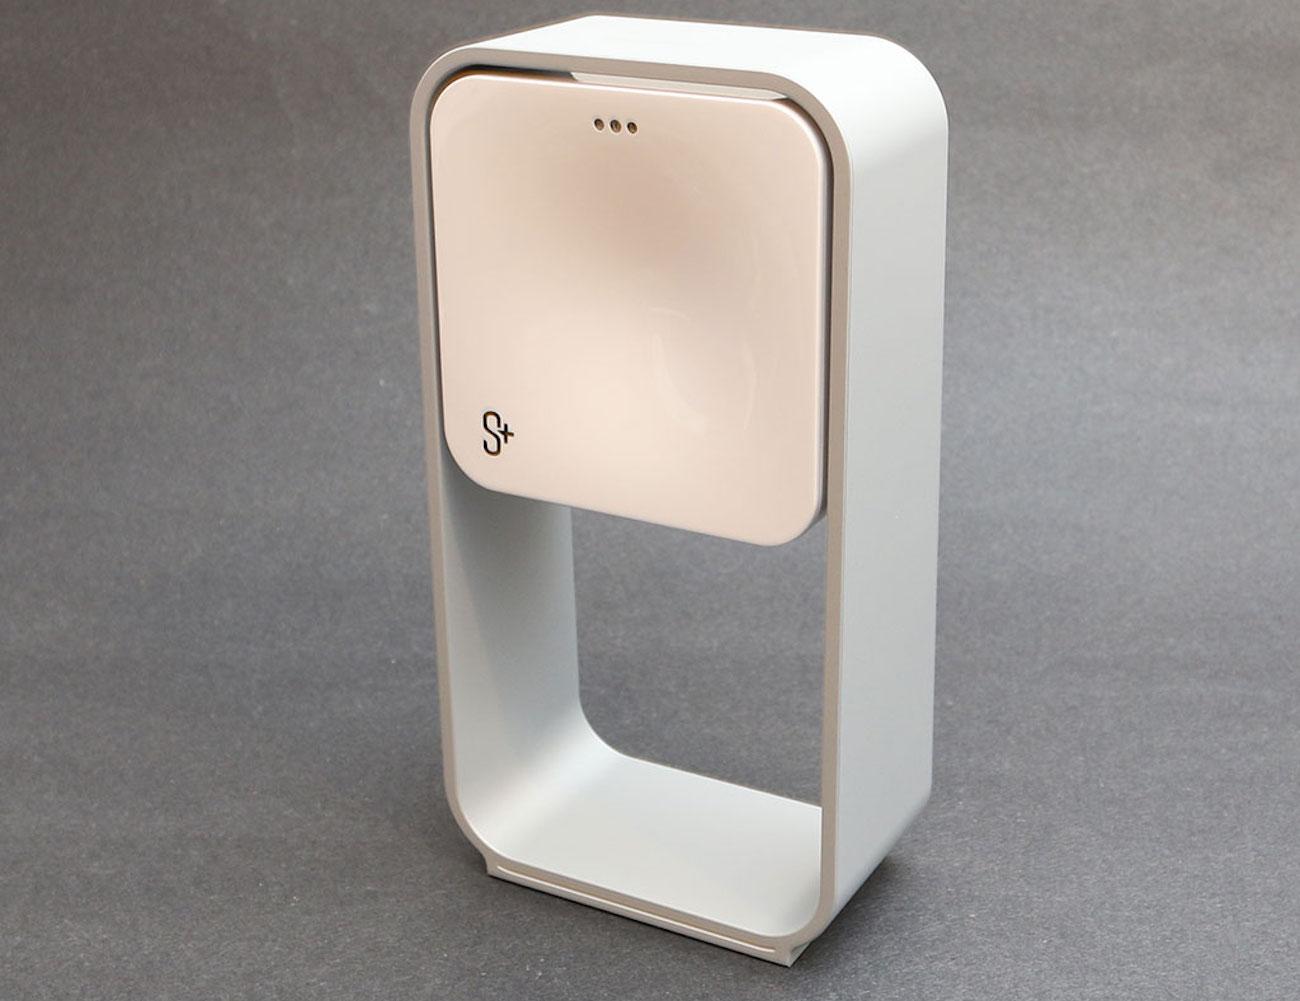 S+ Personal Sleep Sensor by ResMed